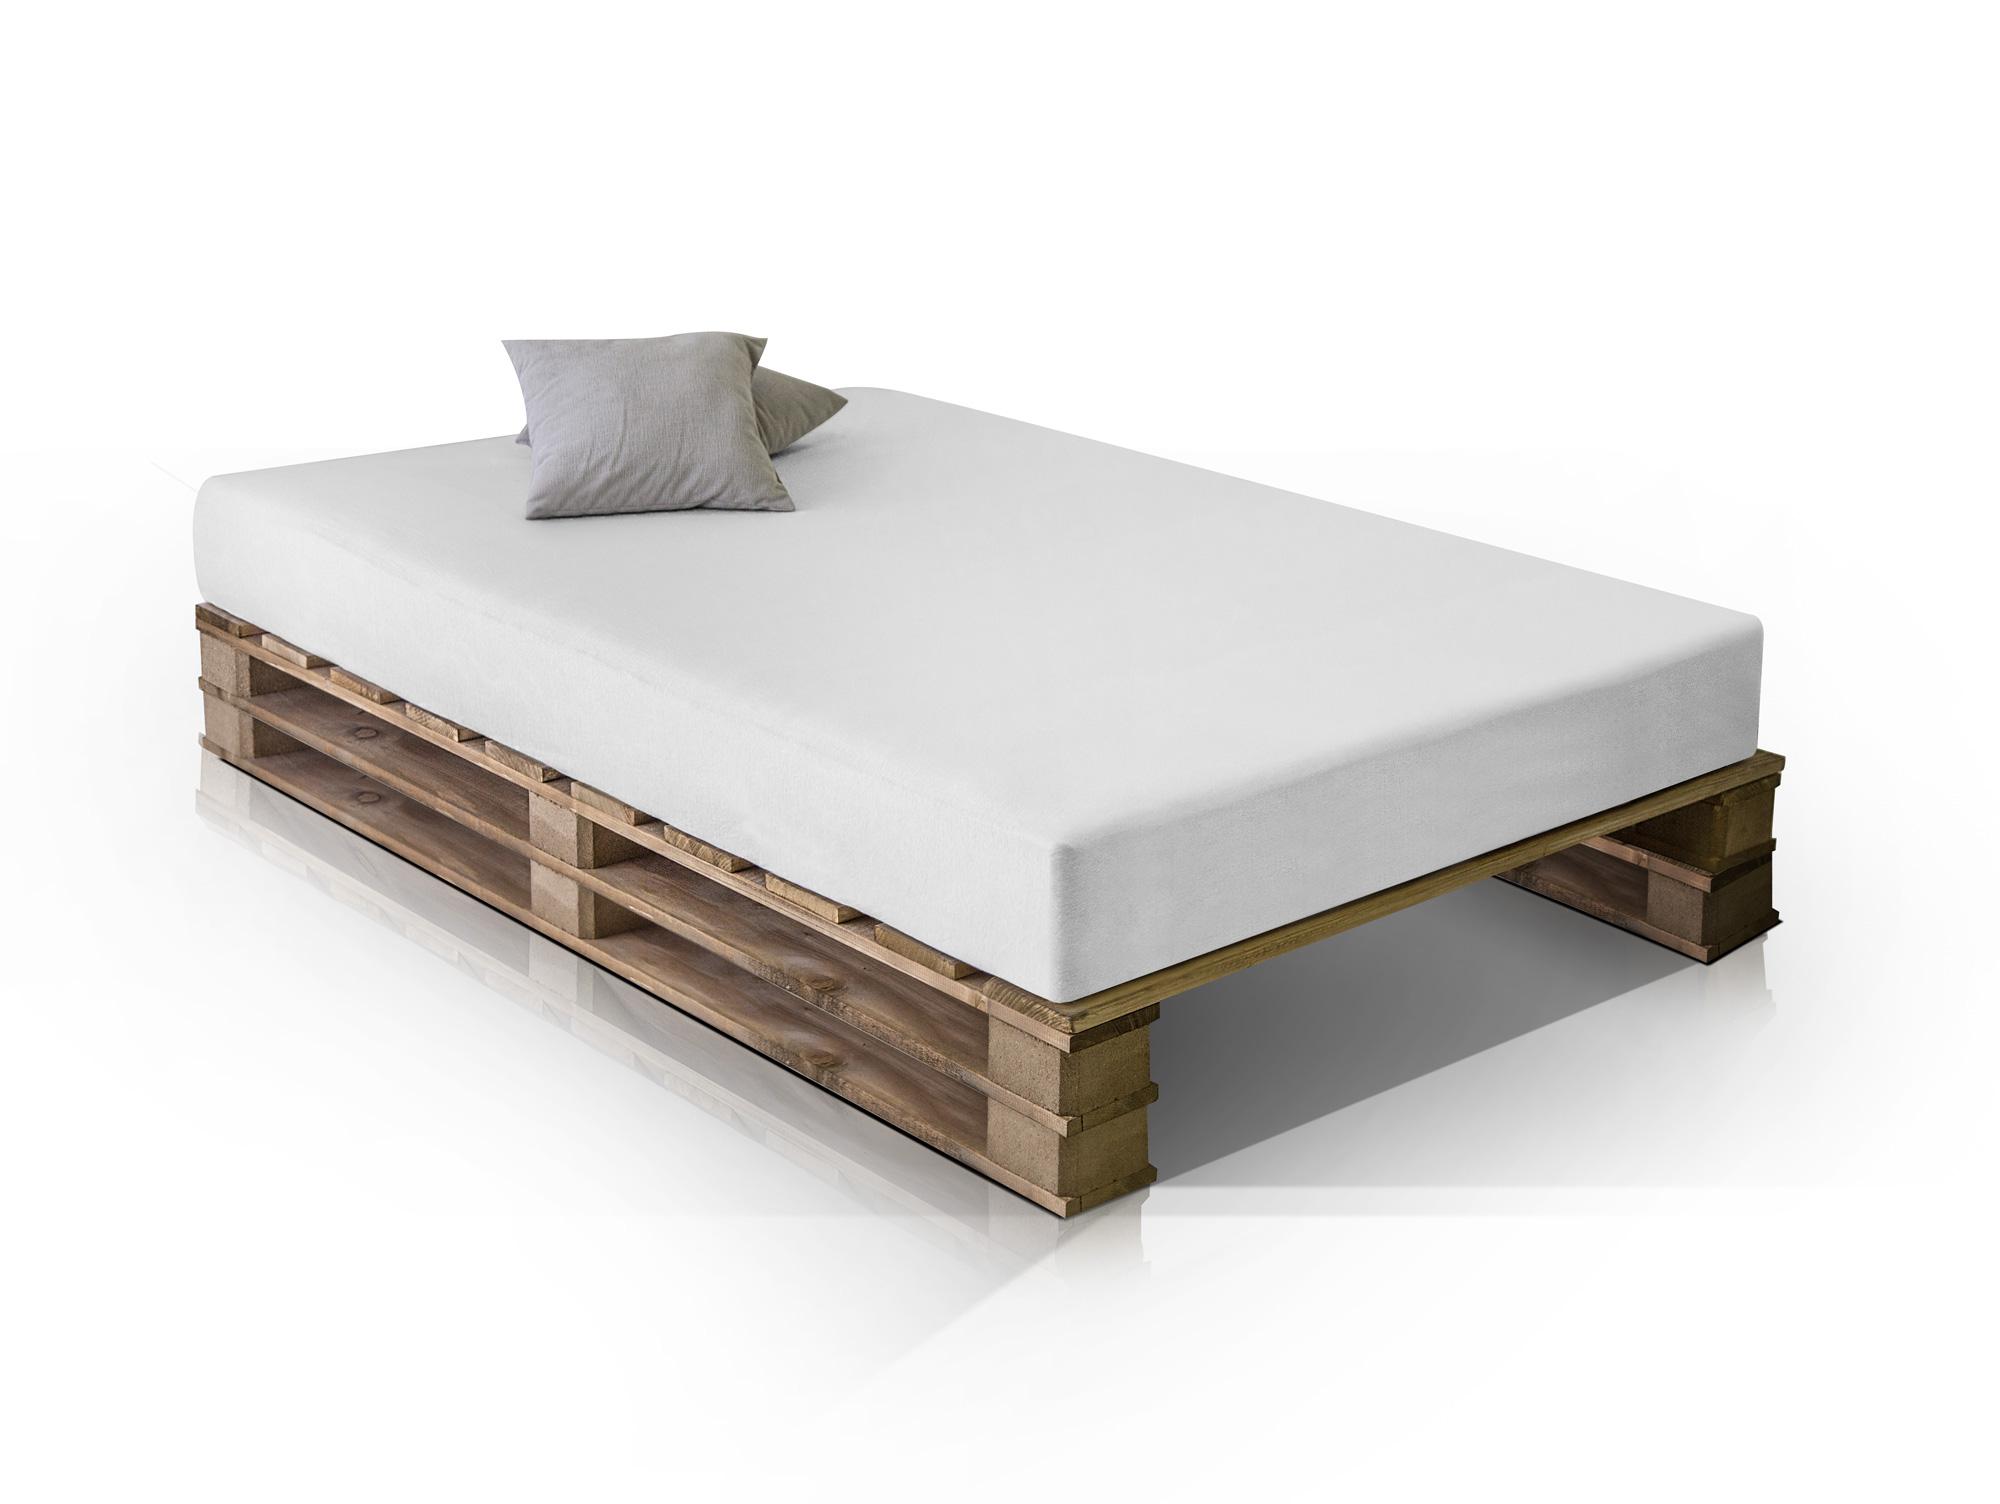 paletti duo massivholzbett palettenbett rustikal gebeizt 120 x 200 cm. Black Bedroom Furniture Sets. Home Design Ideas